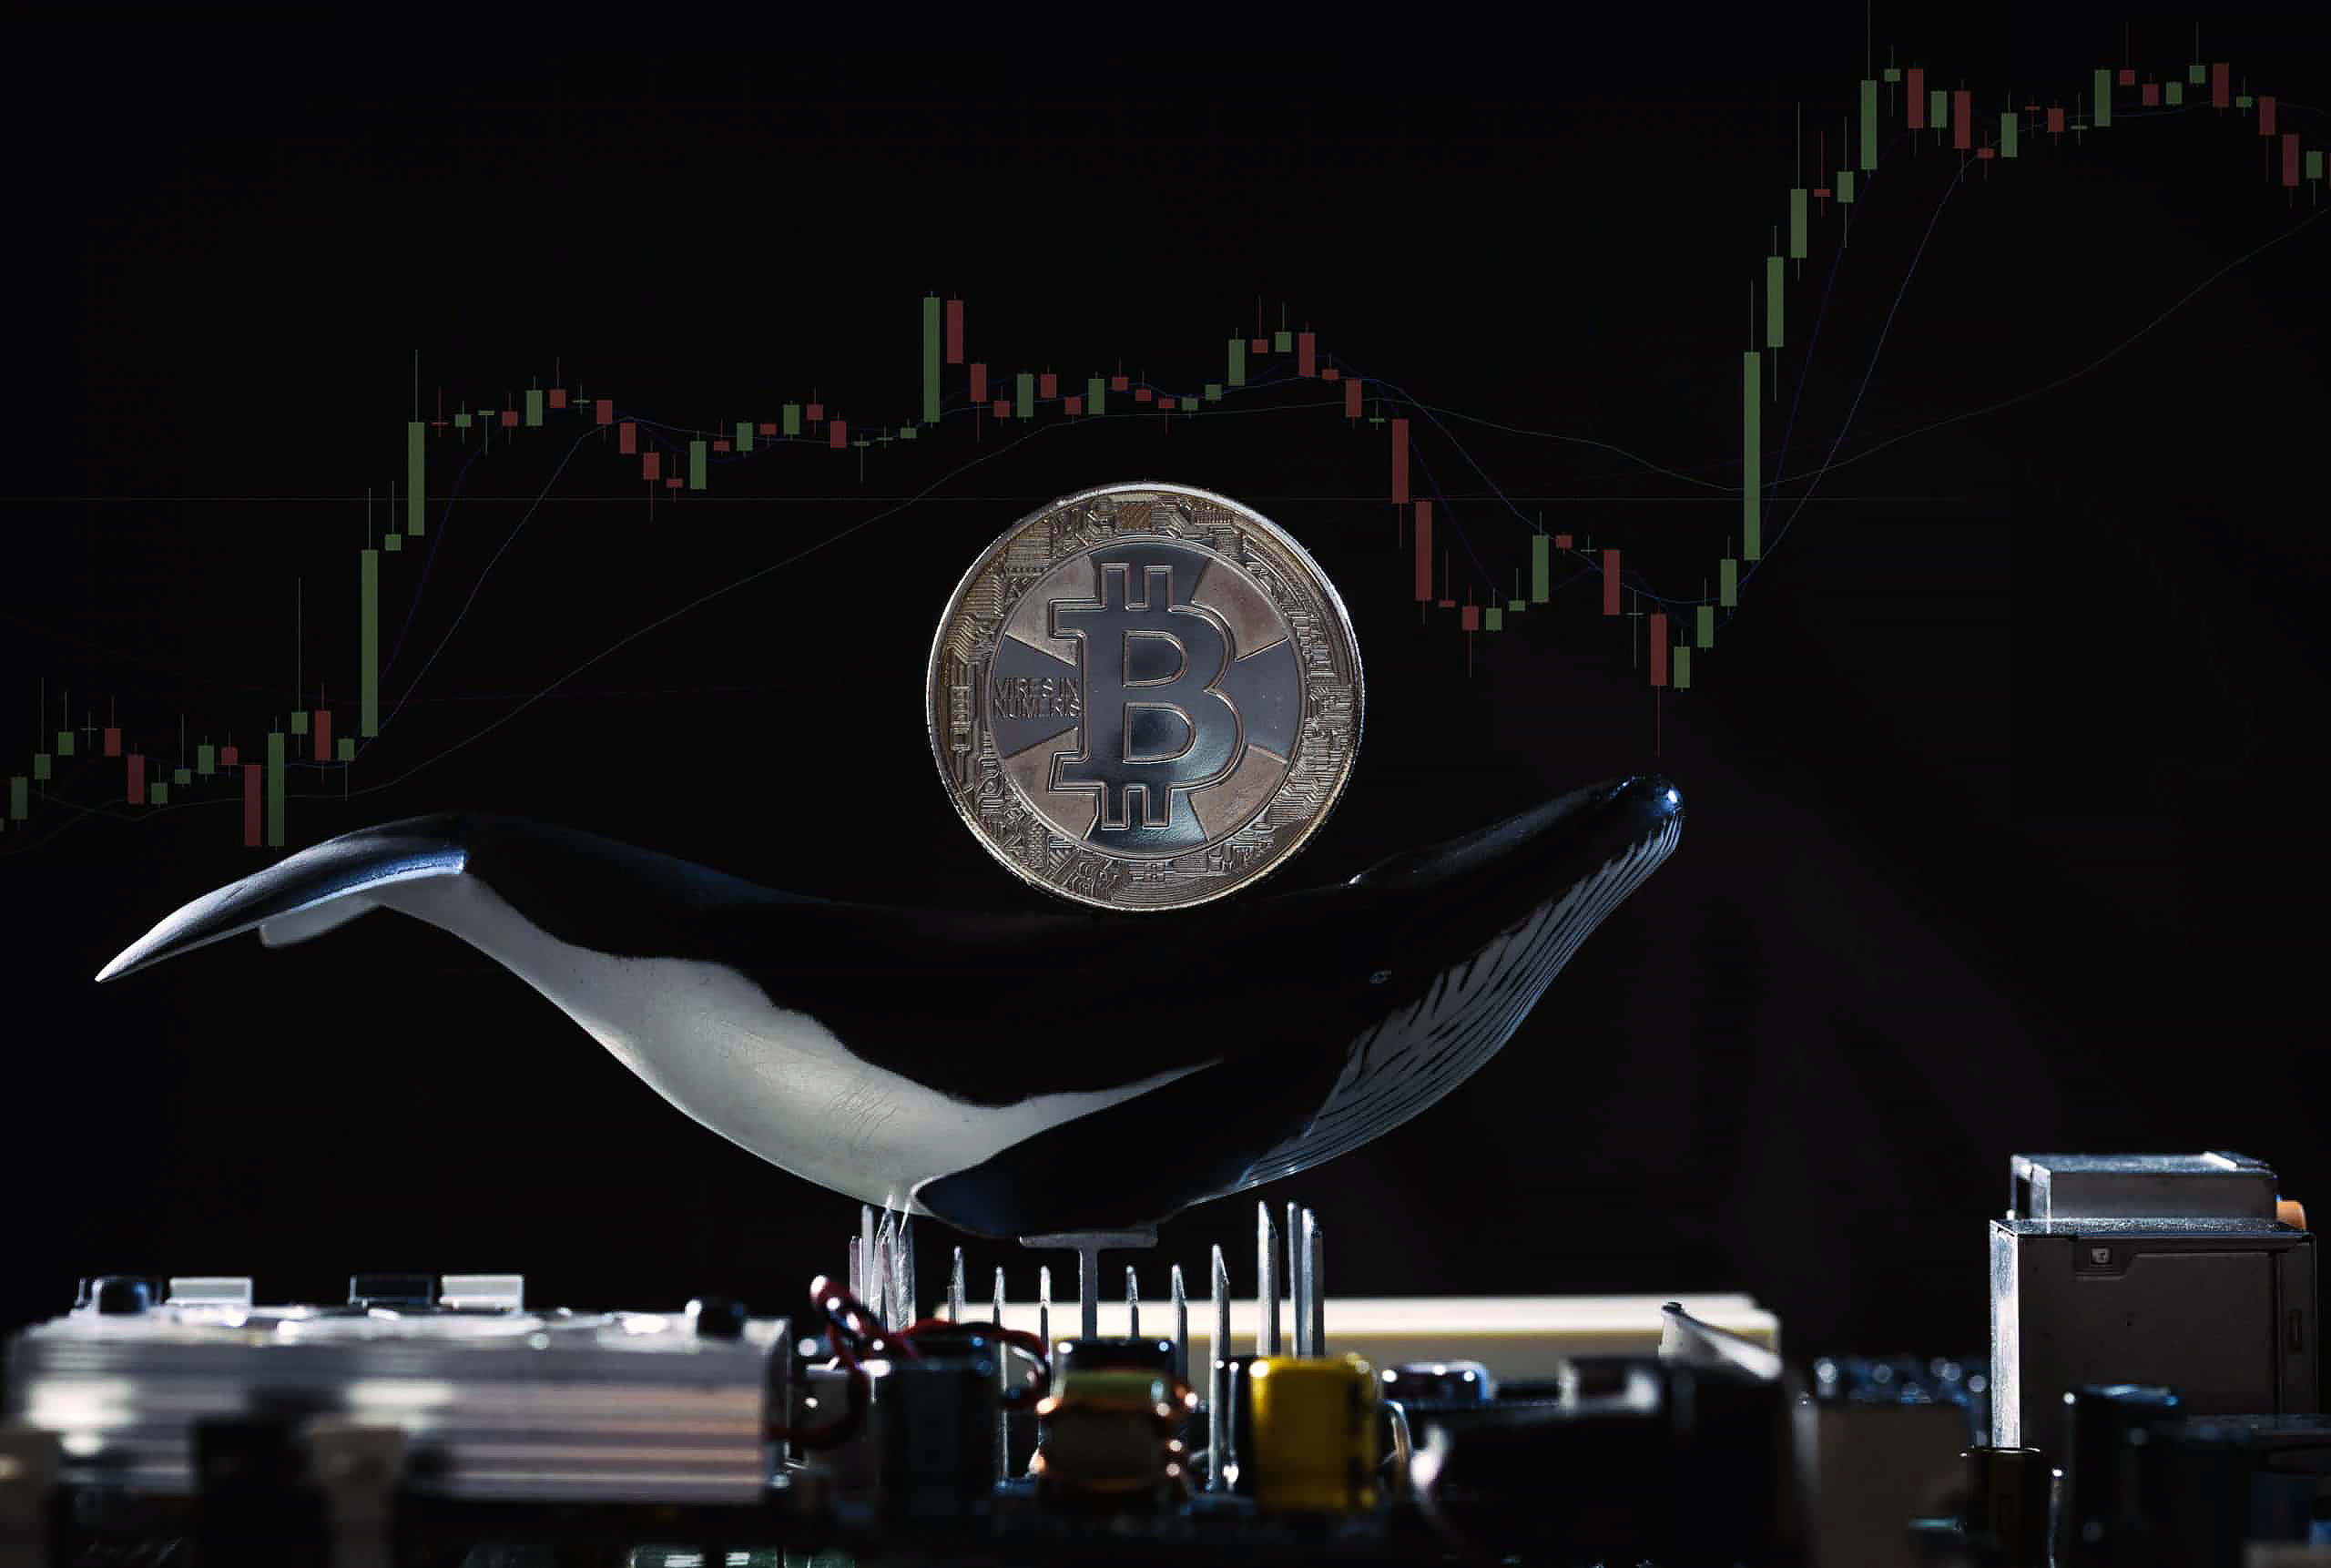 bitcoin balinasi artis yasiyor btc fiyati bitcoin fiyati